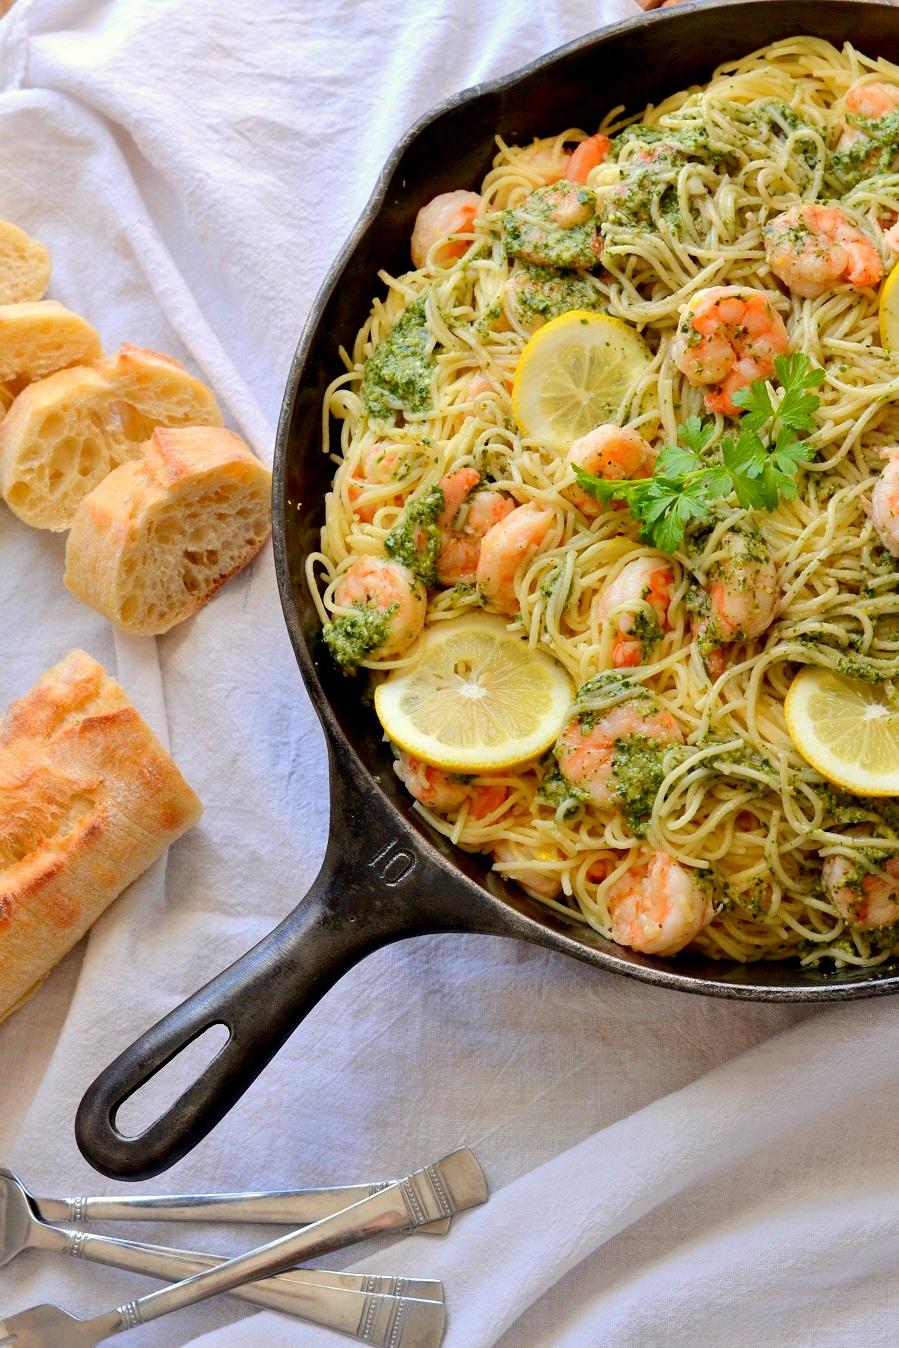 Lemon Parsley Pesto Shrimp Pasta